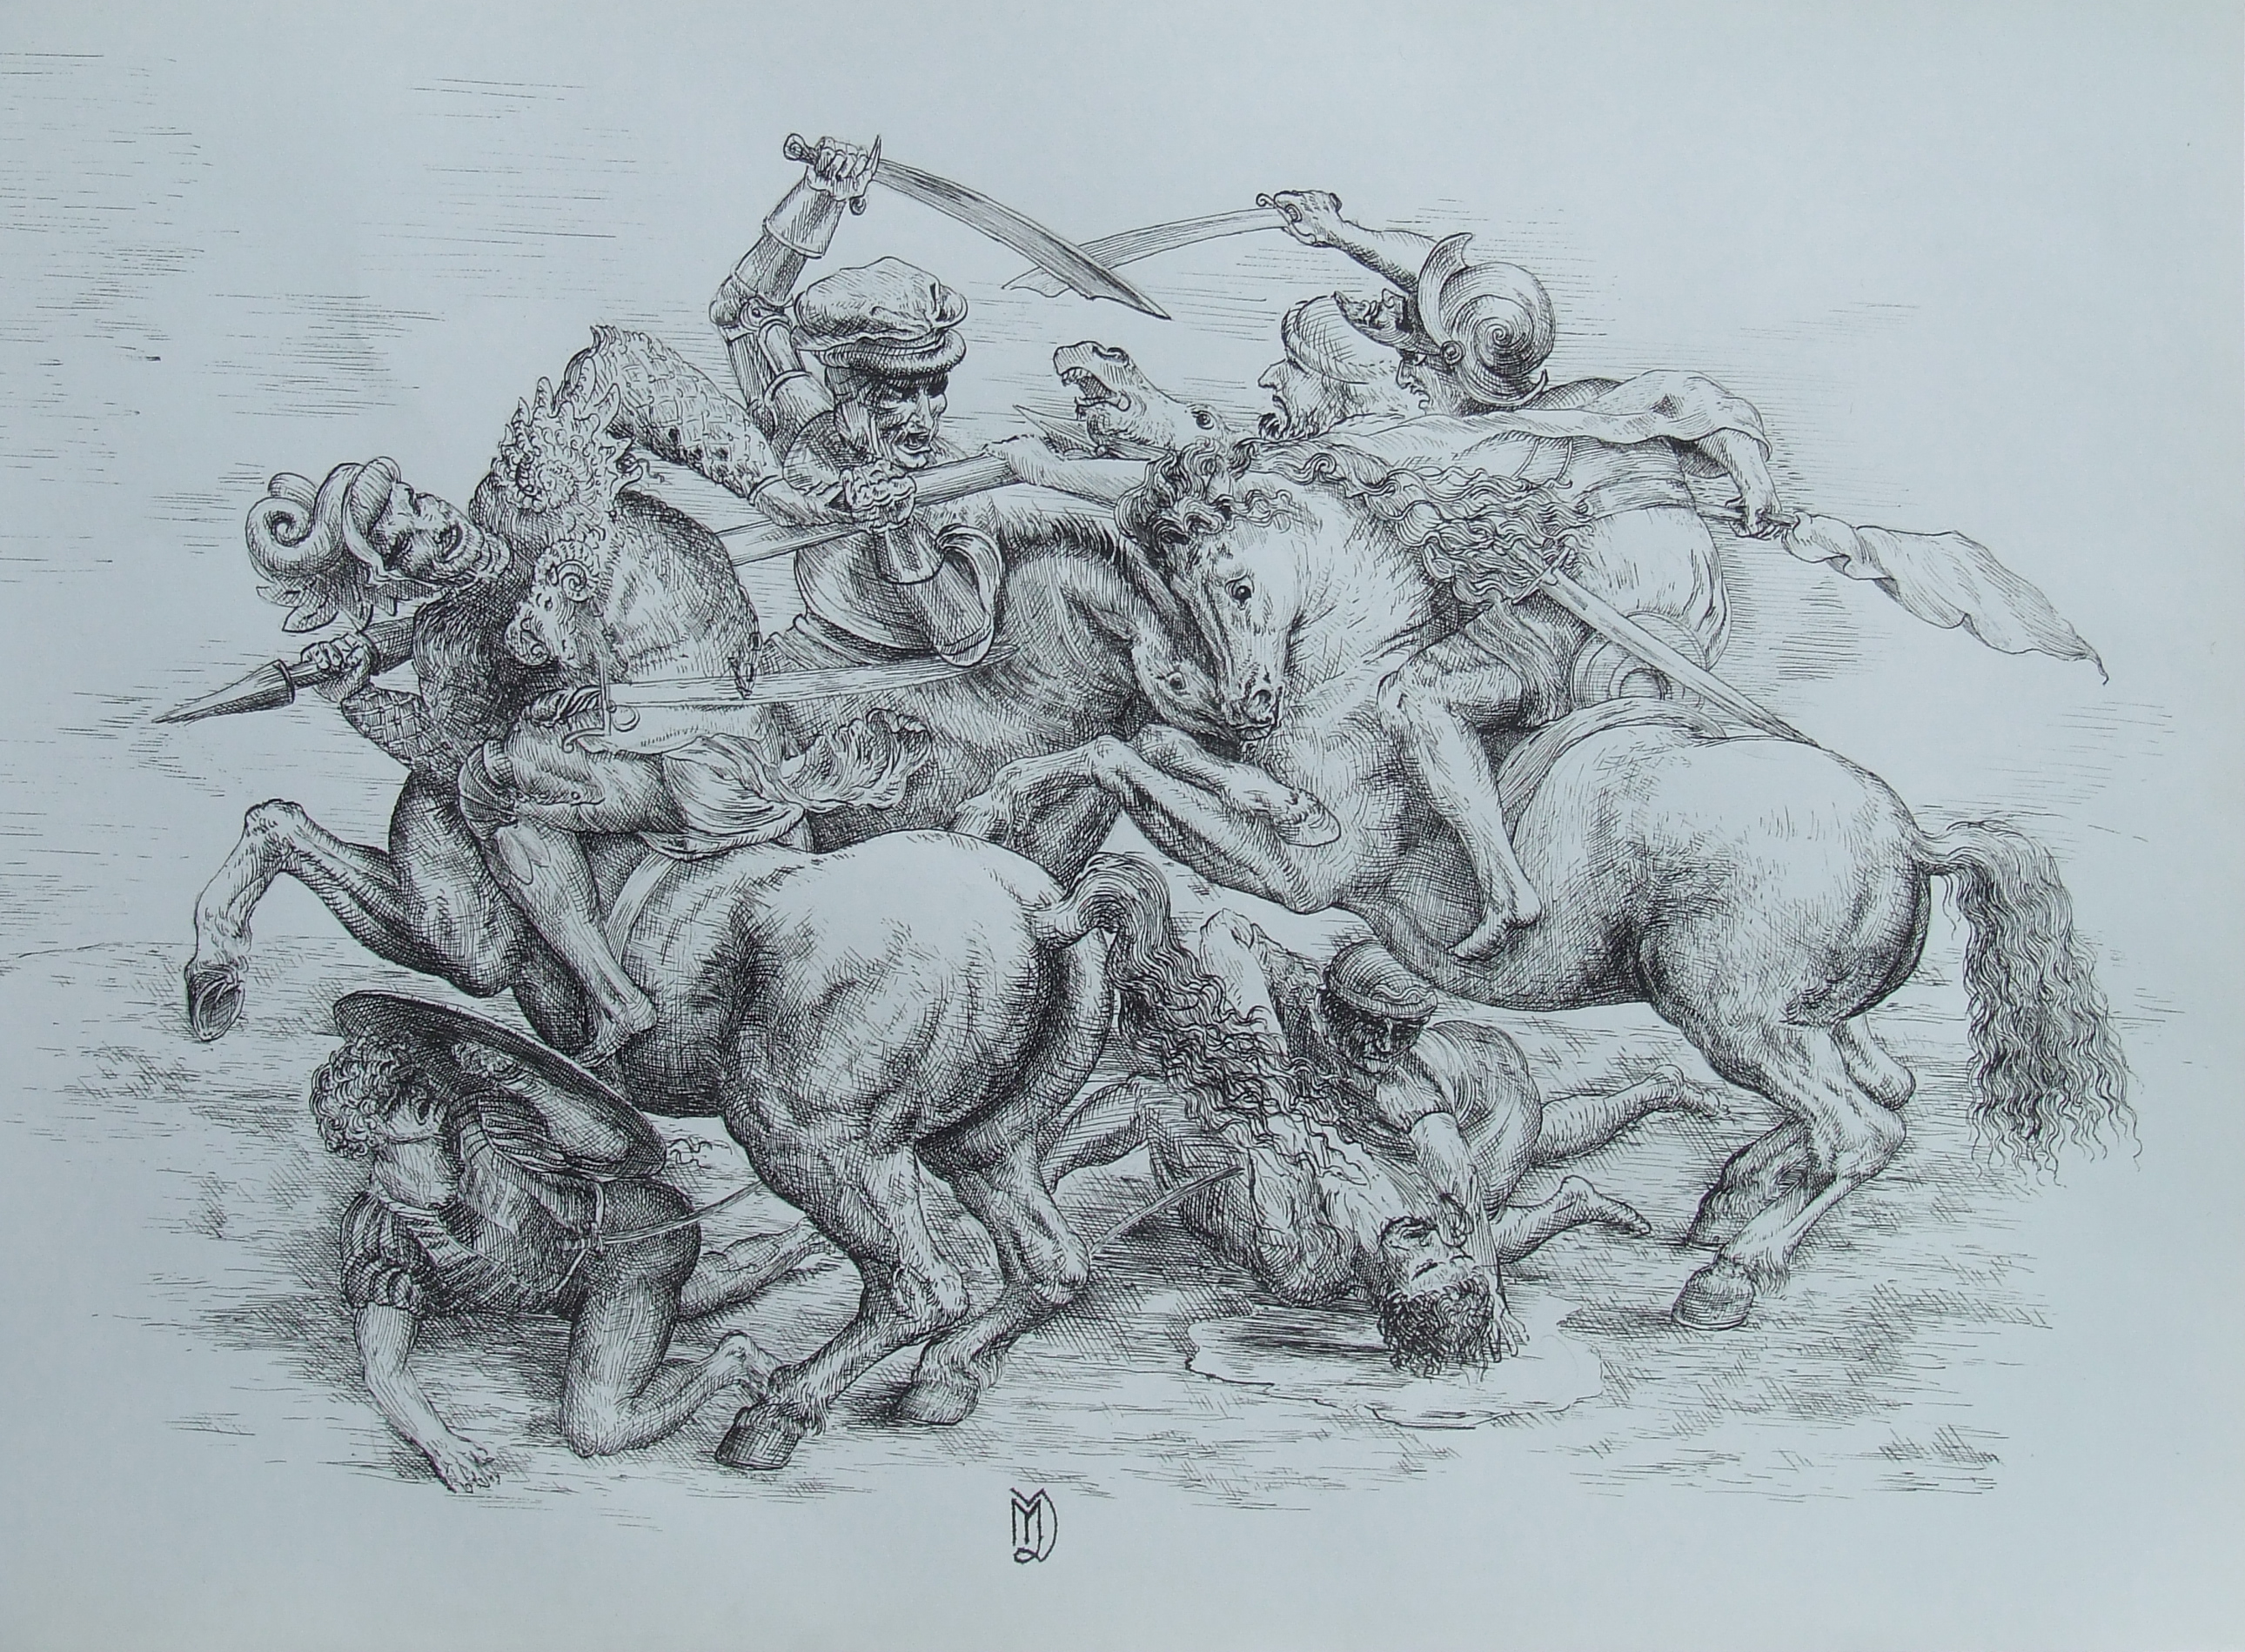 HD Quality Wallpaper | Collection: Artistic, 2580x1899 Battle Of Anghiari